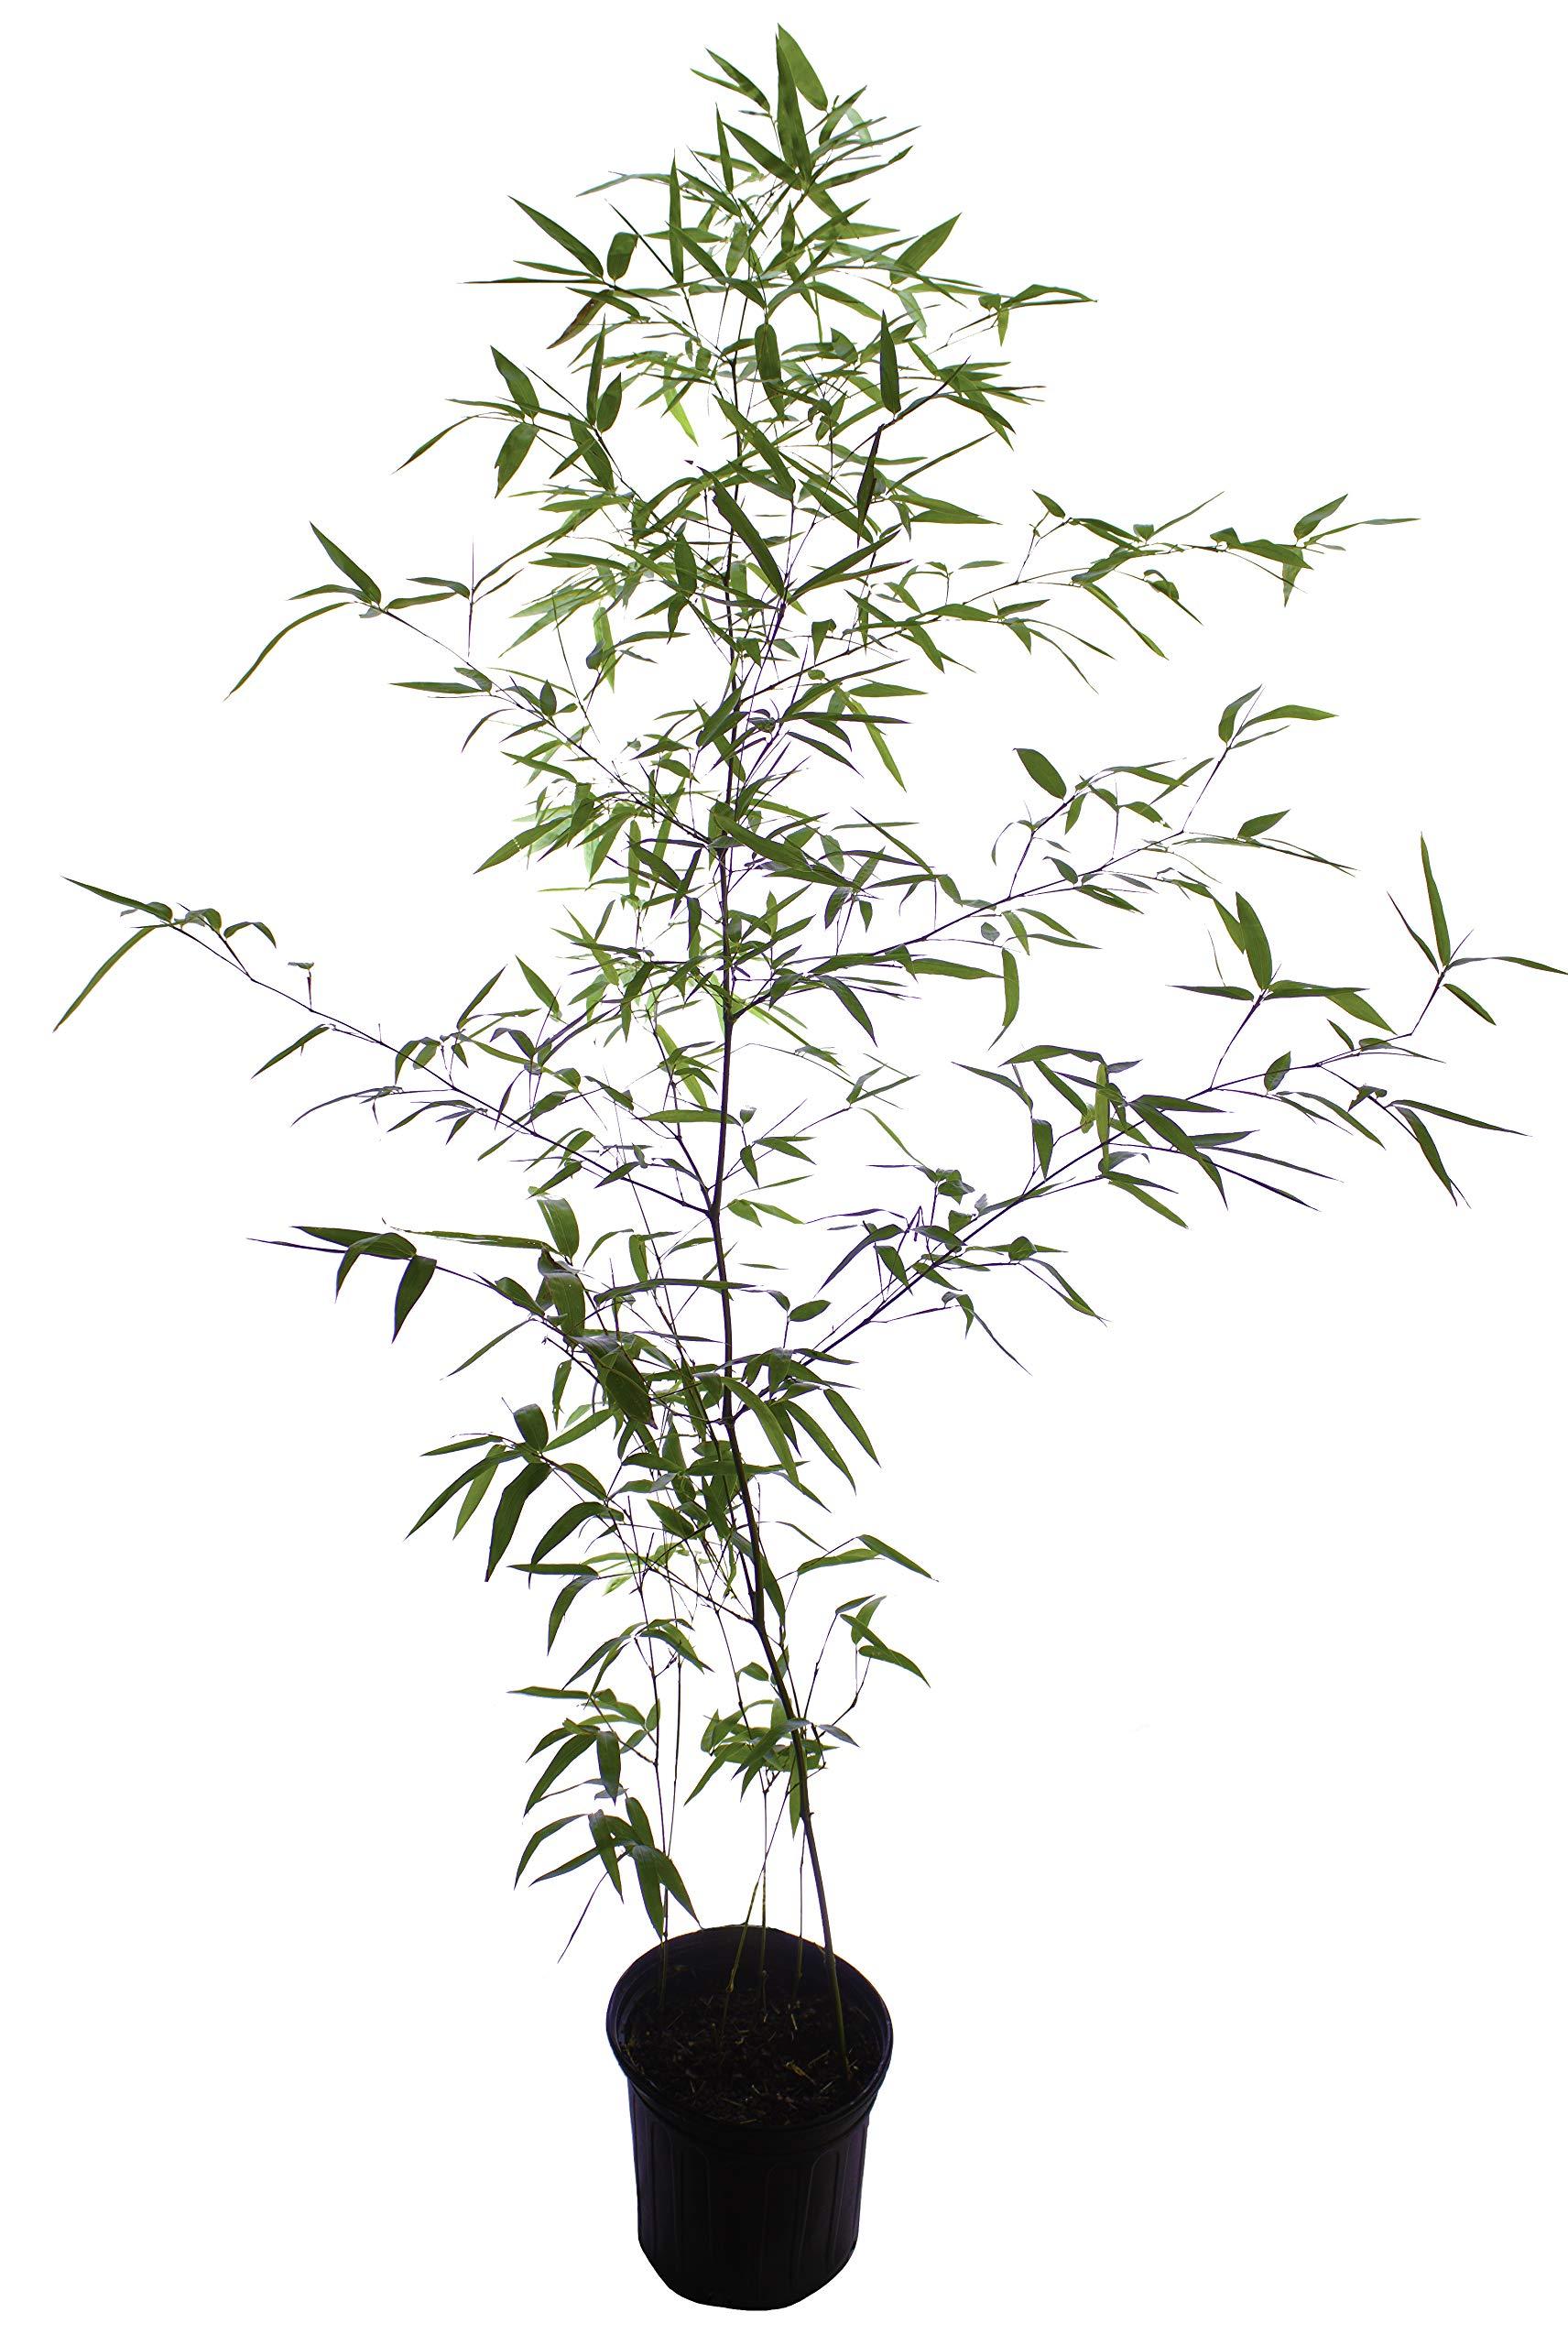 Incense Bamboo Phyllostachys Atrovaginata (2 Gallon 2-3 feet Tall)